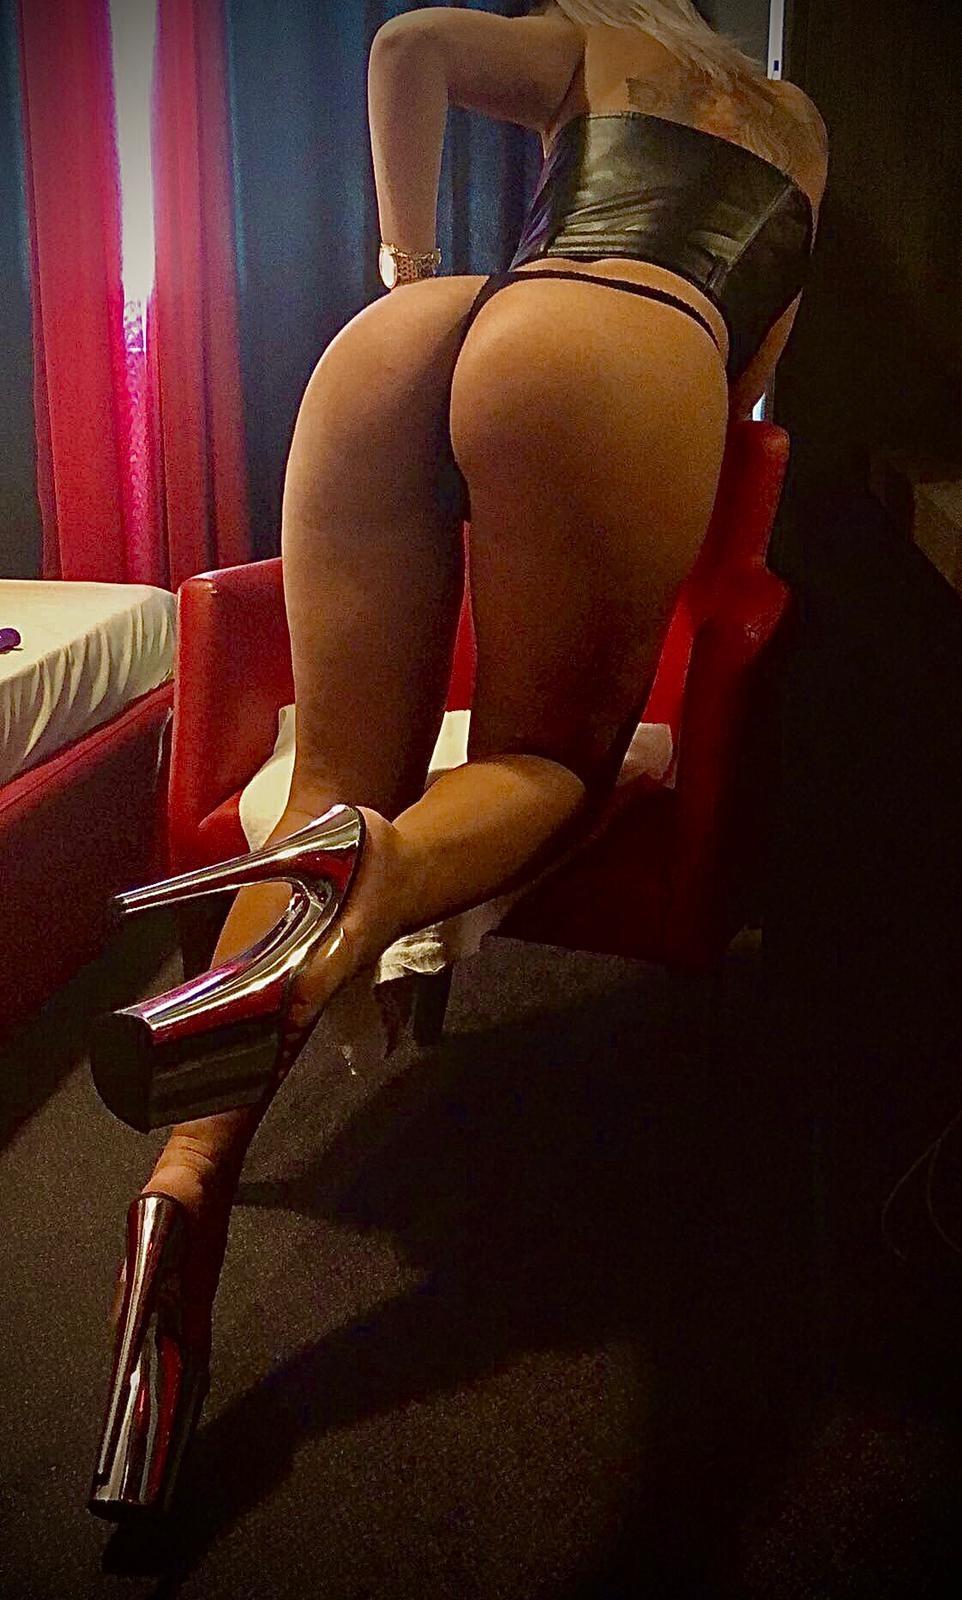 Escorte bcr sex cupluri craiova, fotografii escorte mature romania matura ofer sex oral